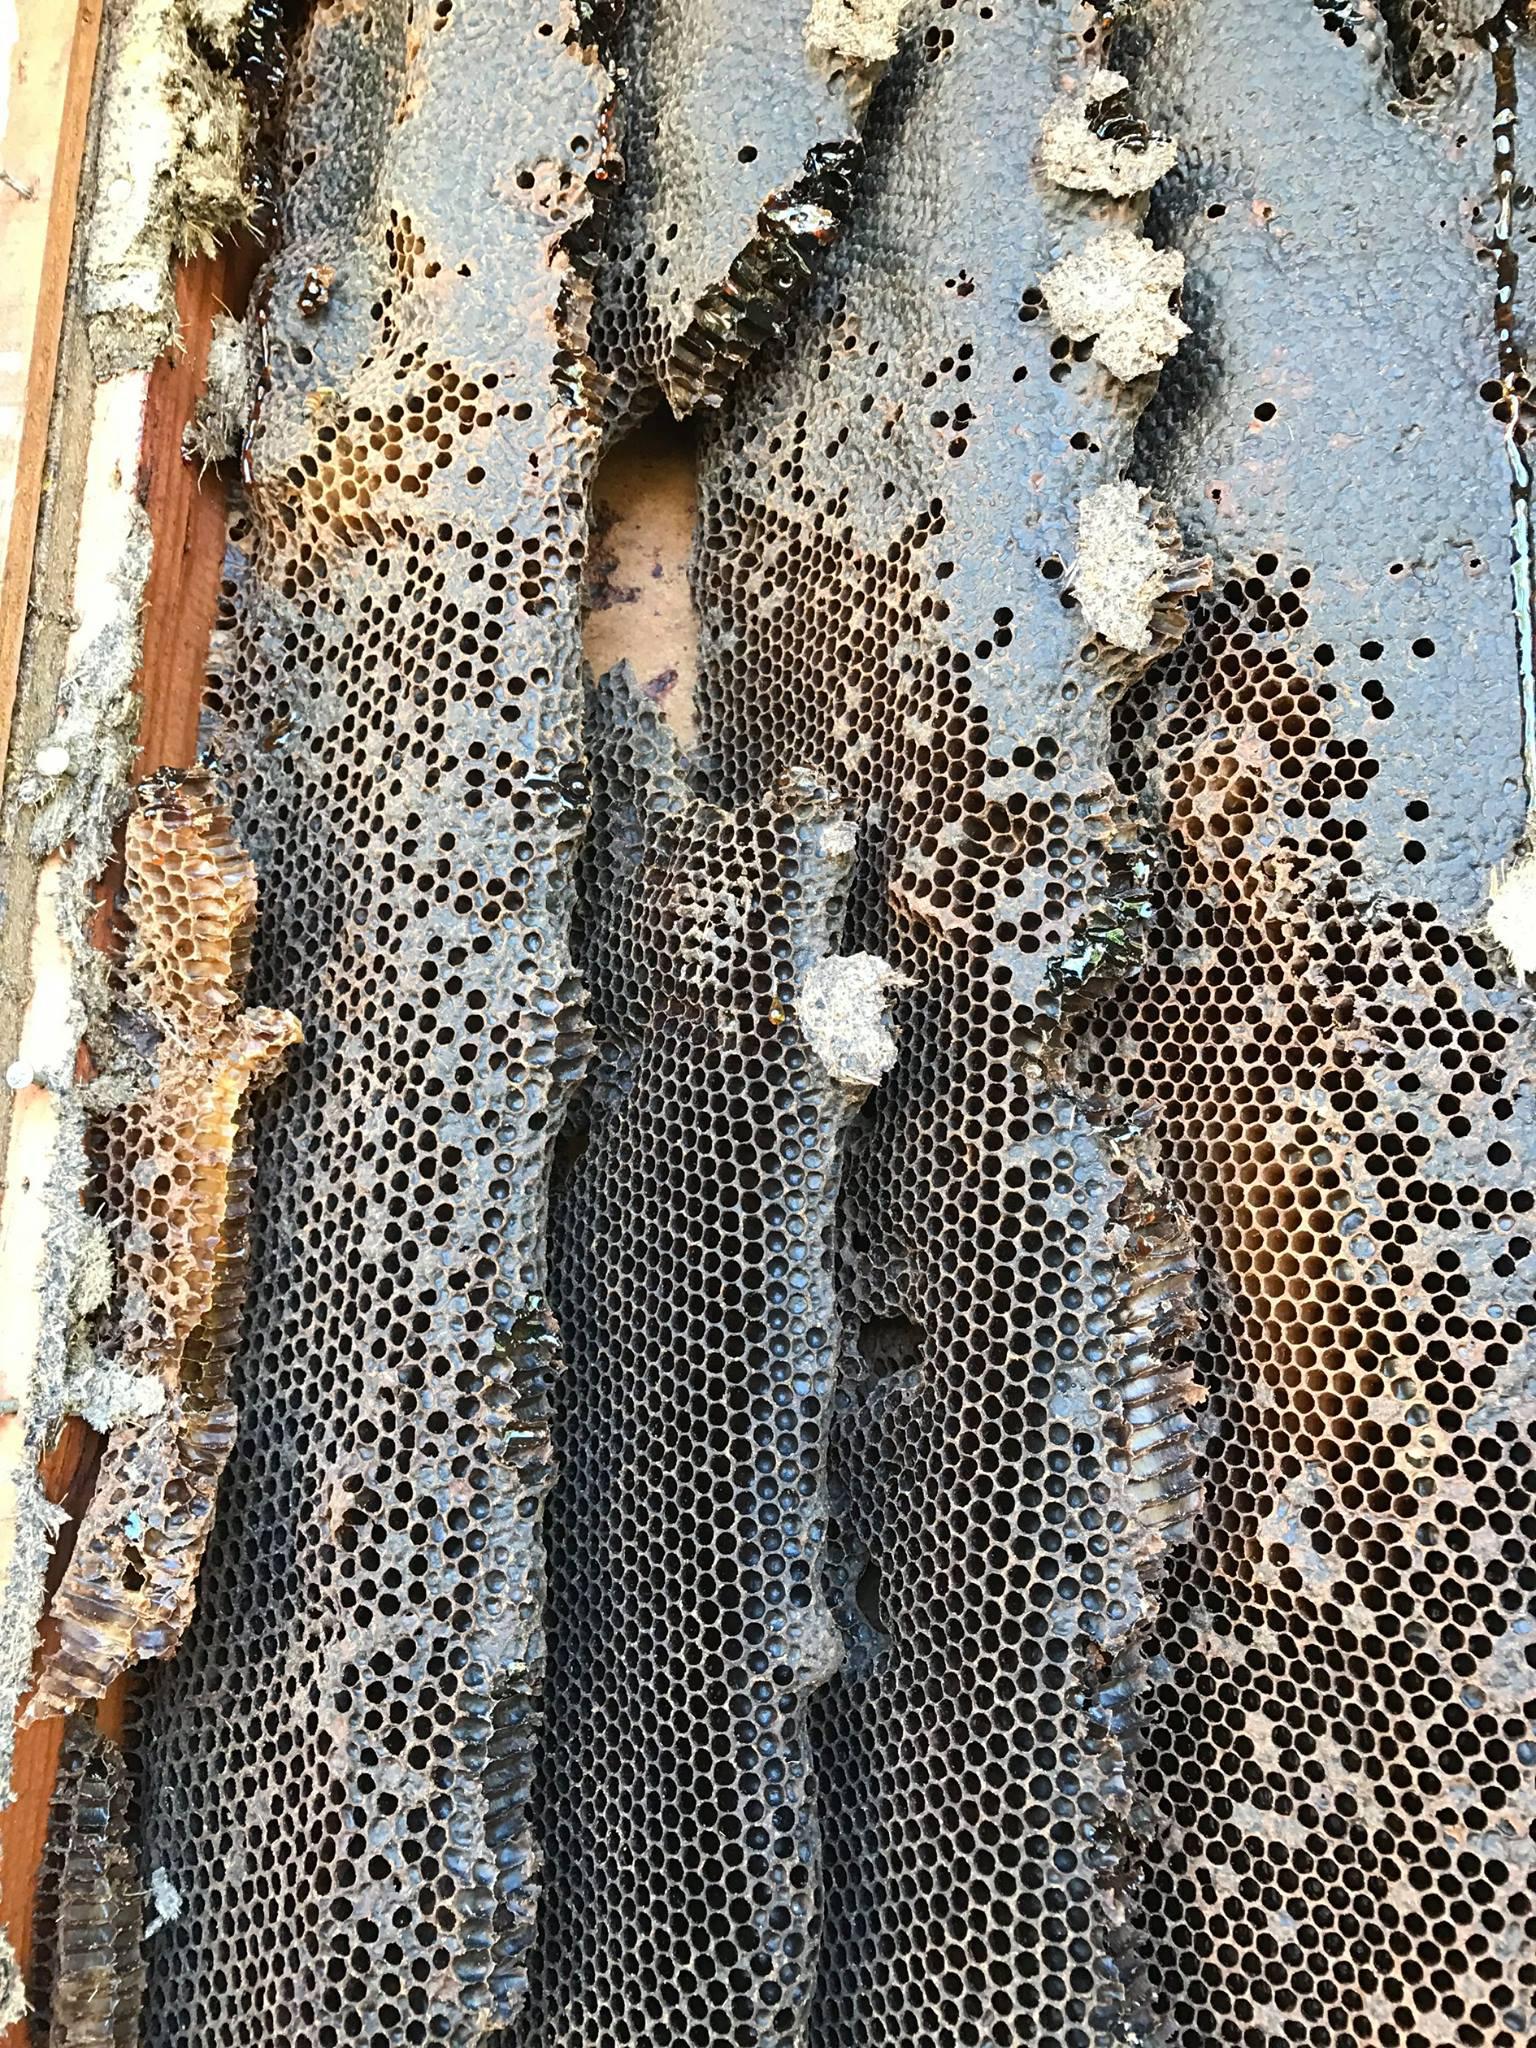 Florida Bee Investigator image 3